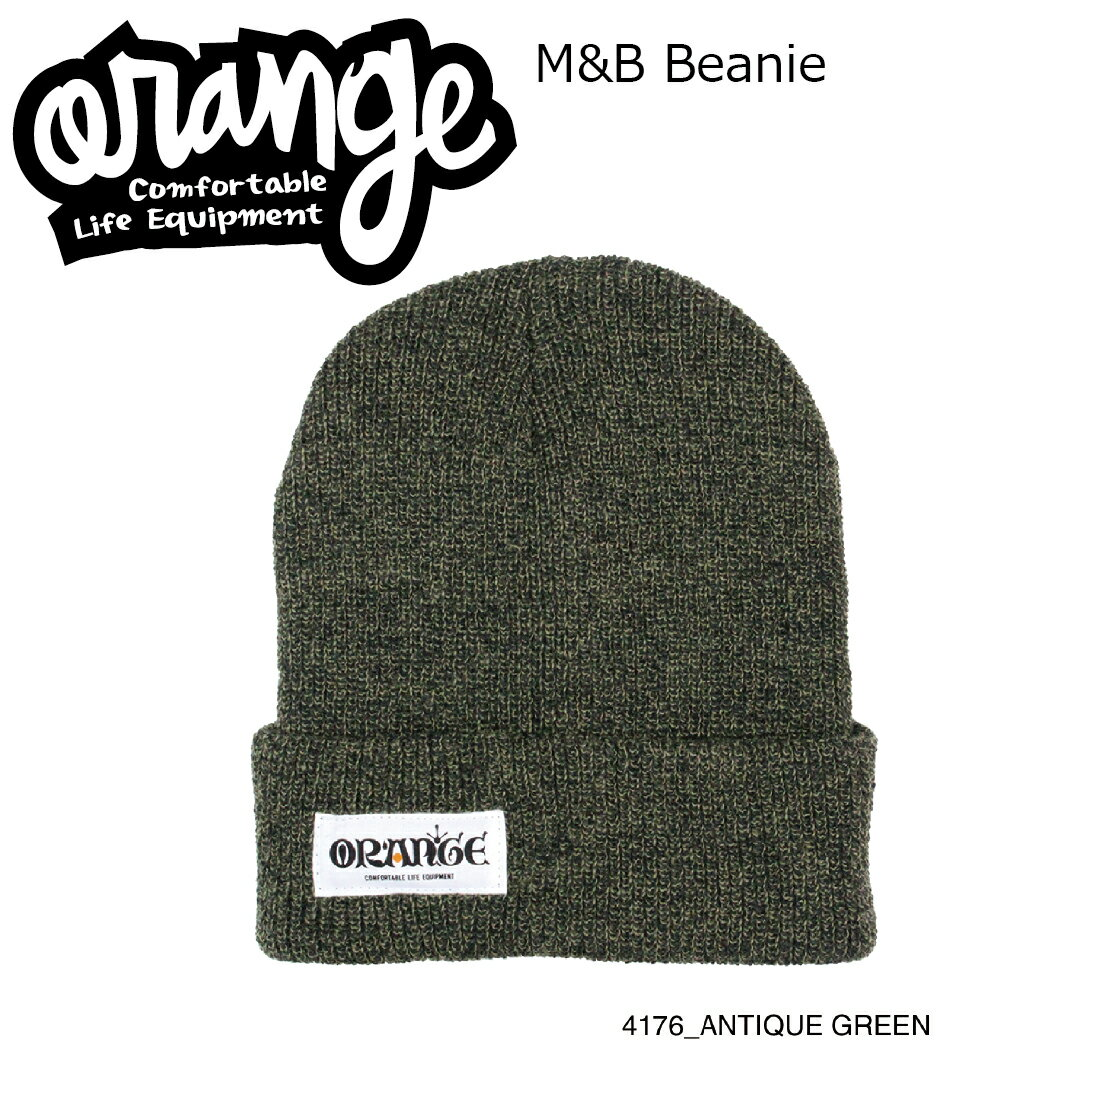 Oran'ge M&B Beanie 4176 ANTIQUE GREEN オレンジ エムアンドビー ビーニー ニットキャップ 2つ折り